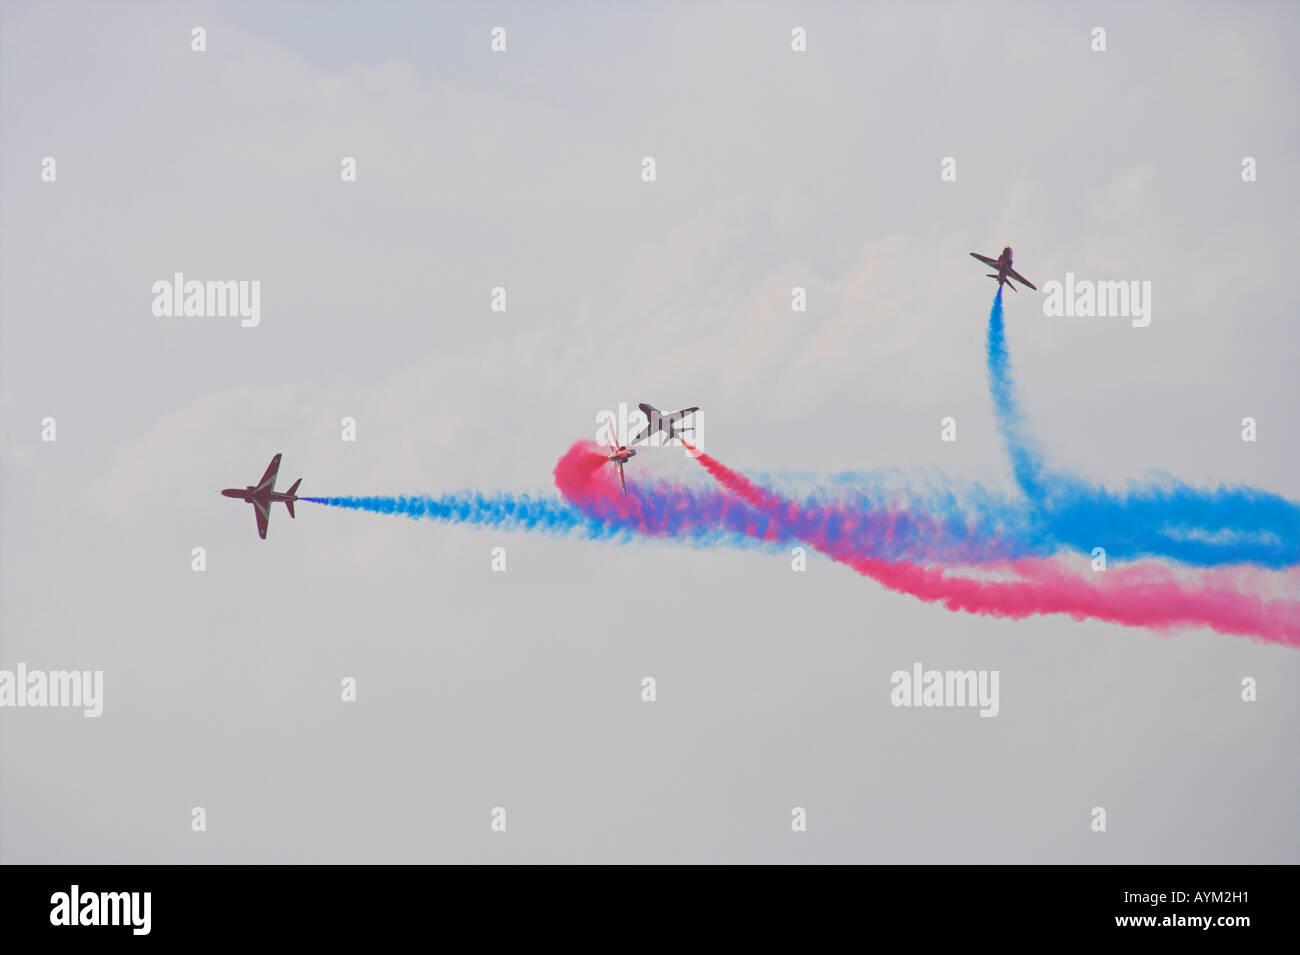 Red Arrows in splitting in a Gypo break manoeuvre - Stock Image